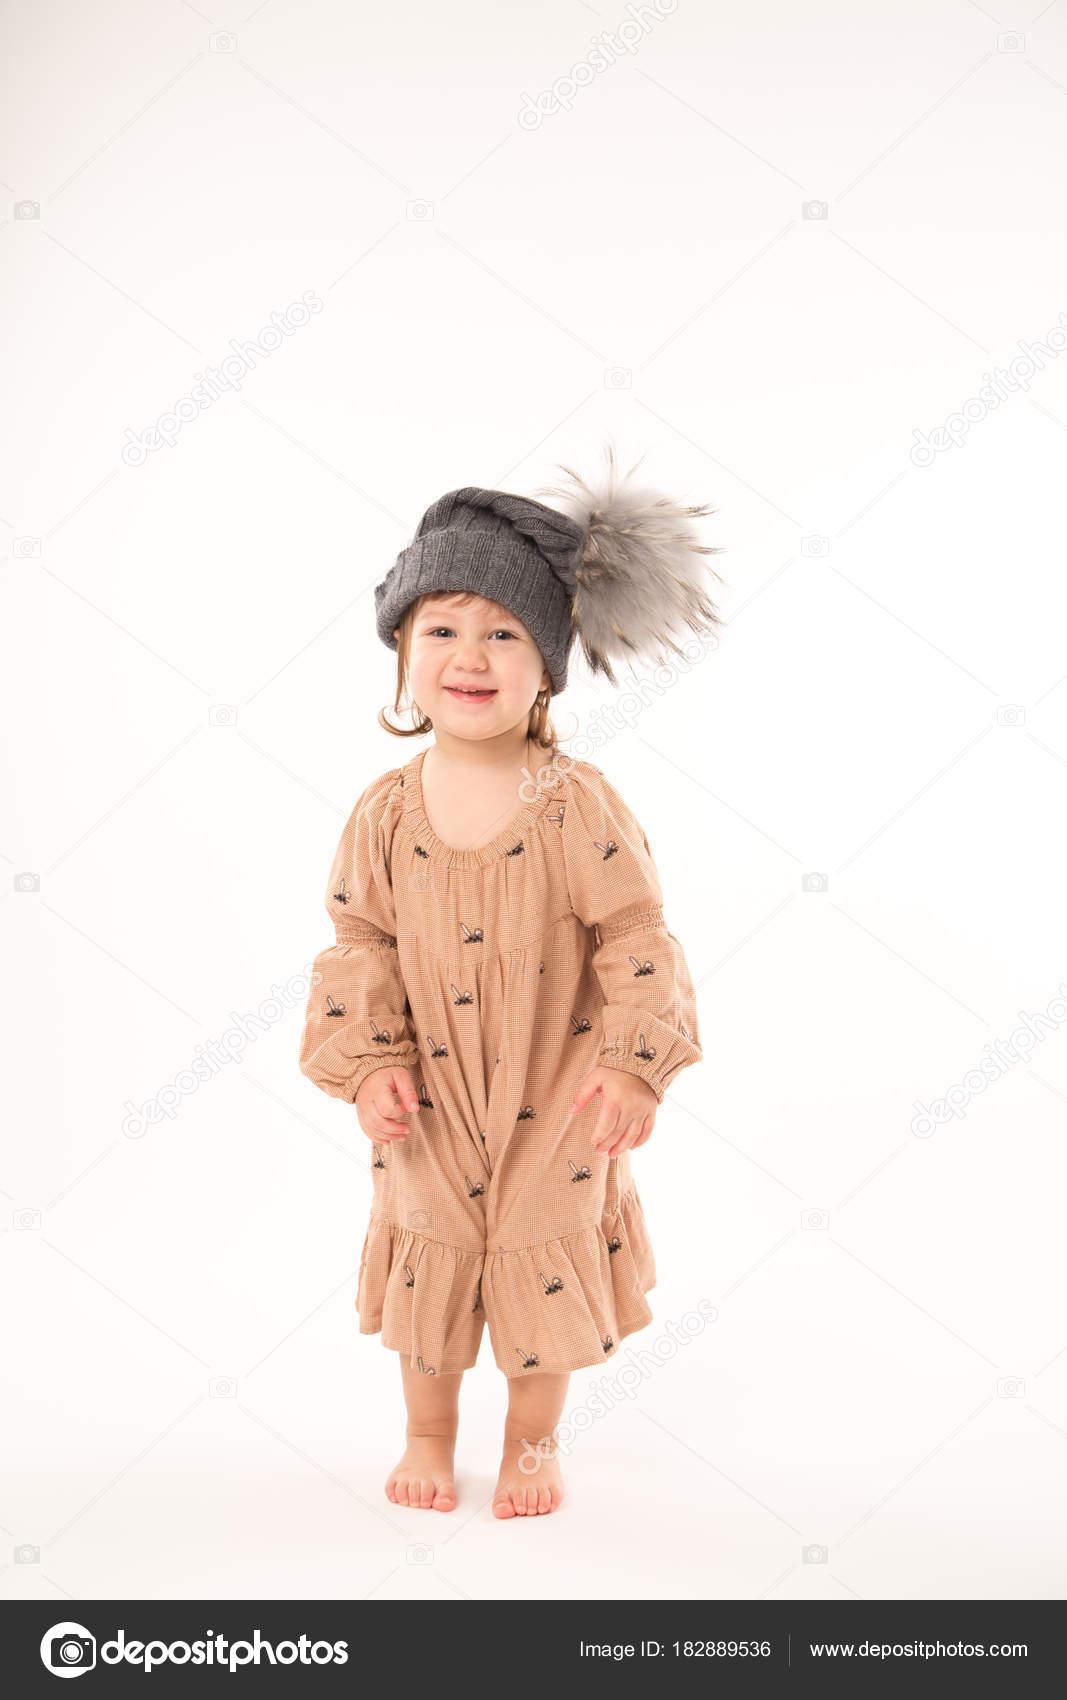 Robe beige petite fille